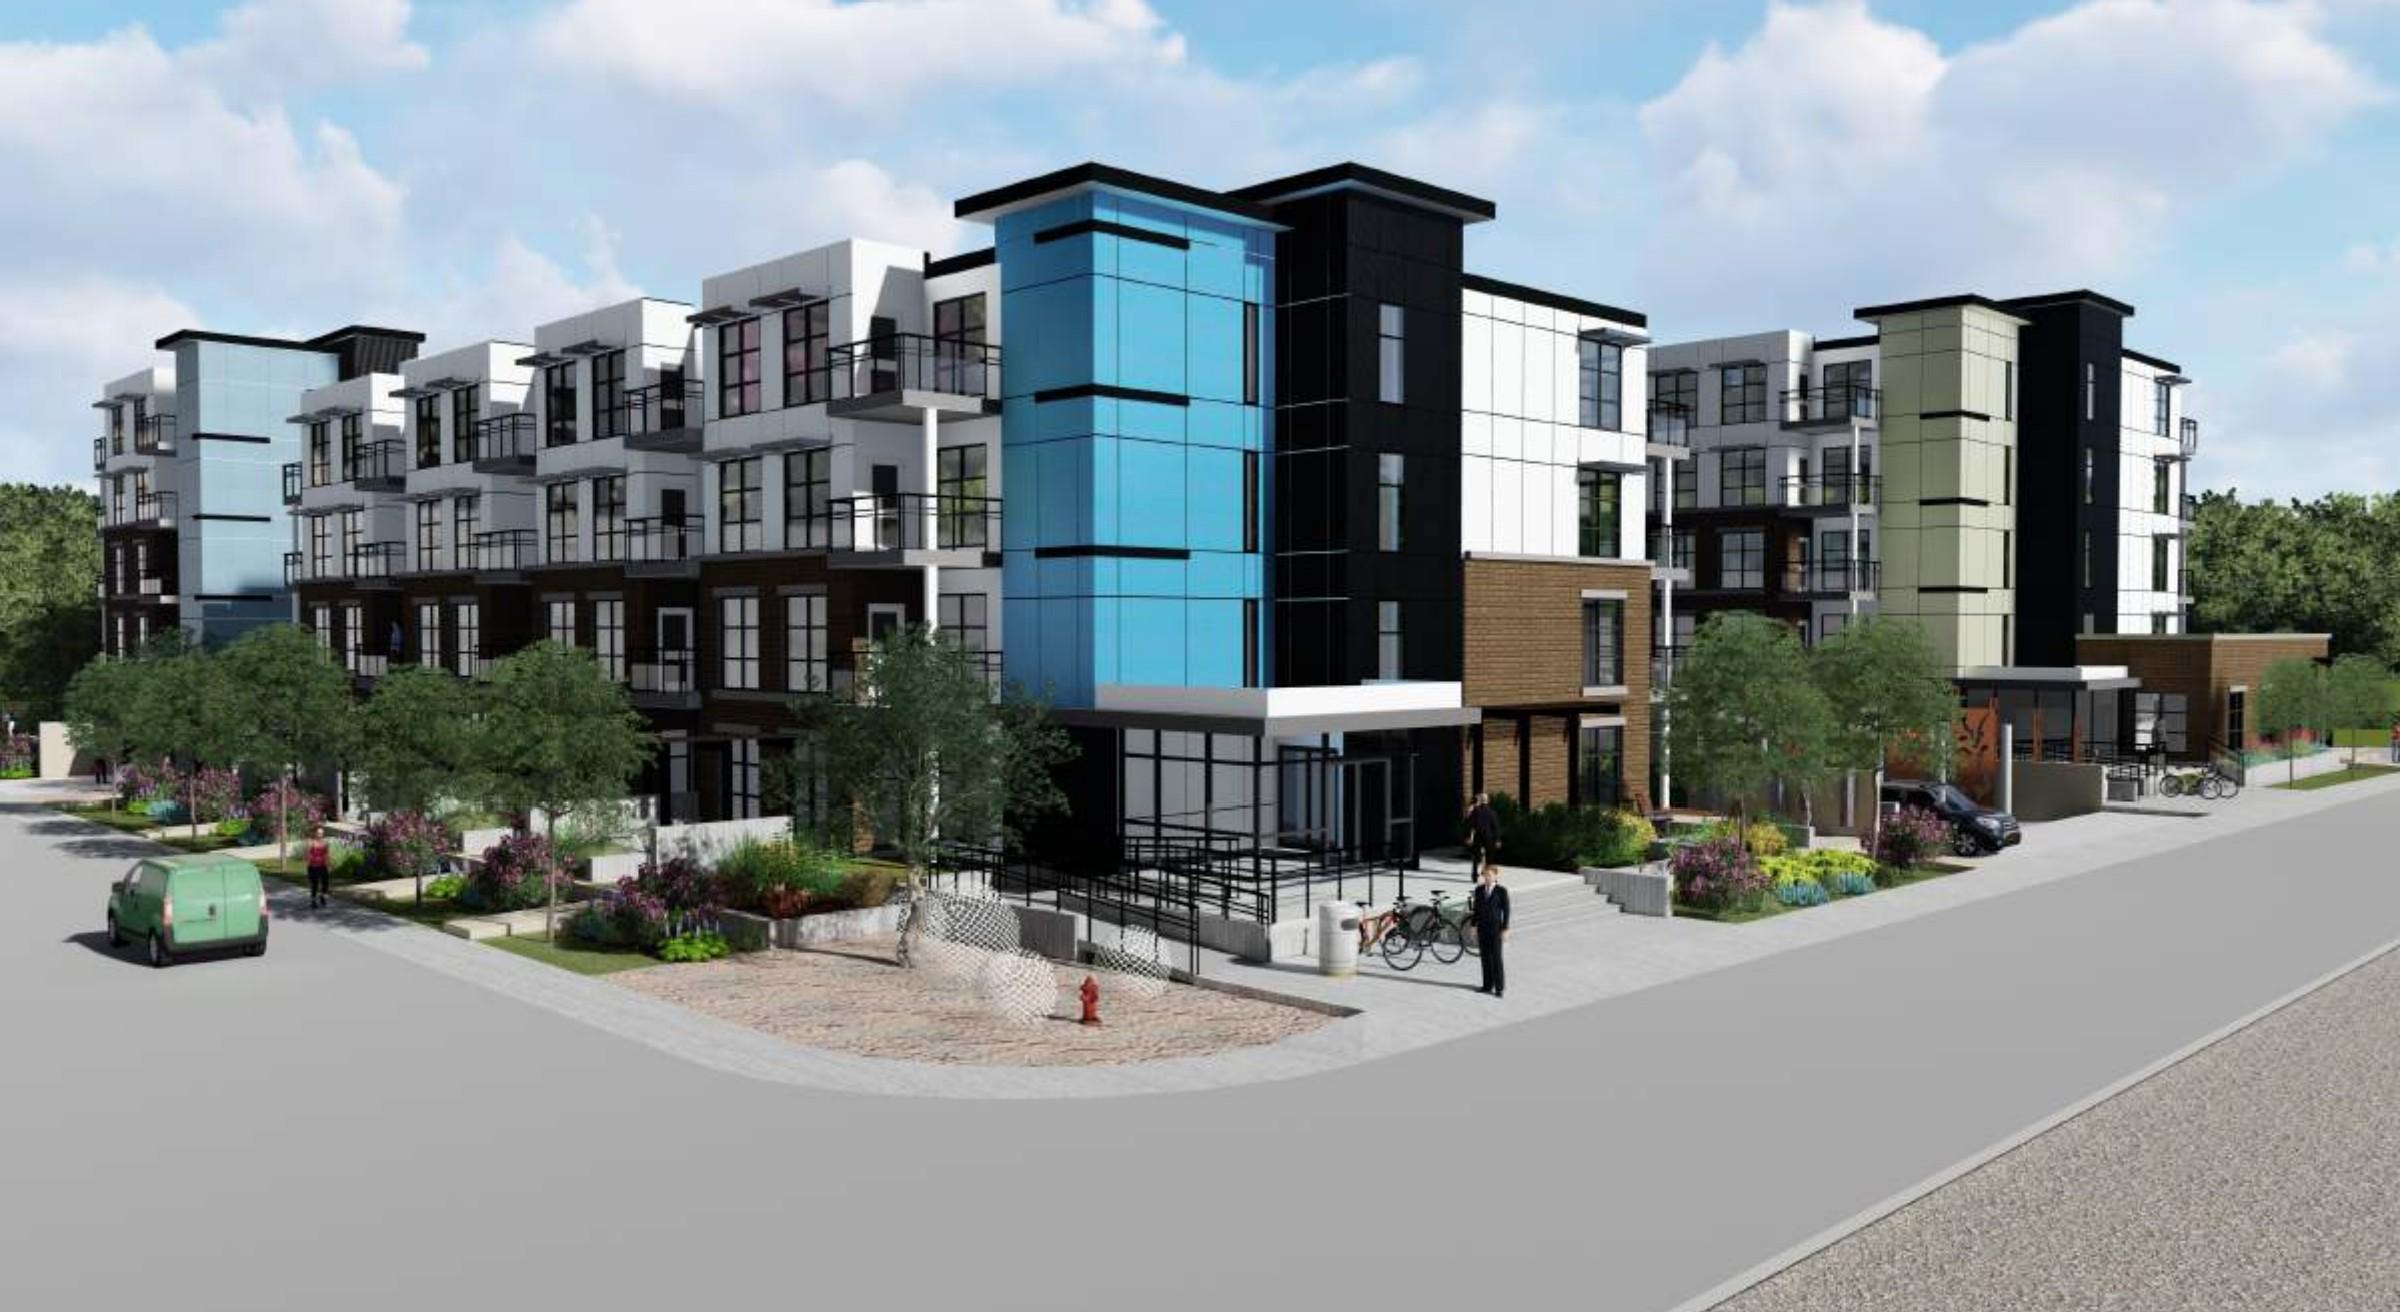 city of kelowna zoning application